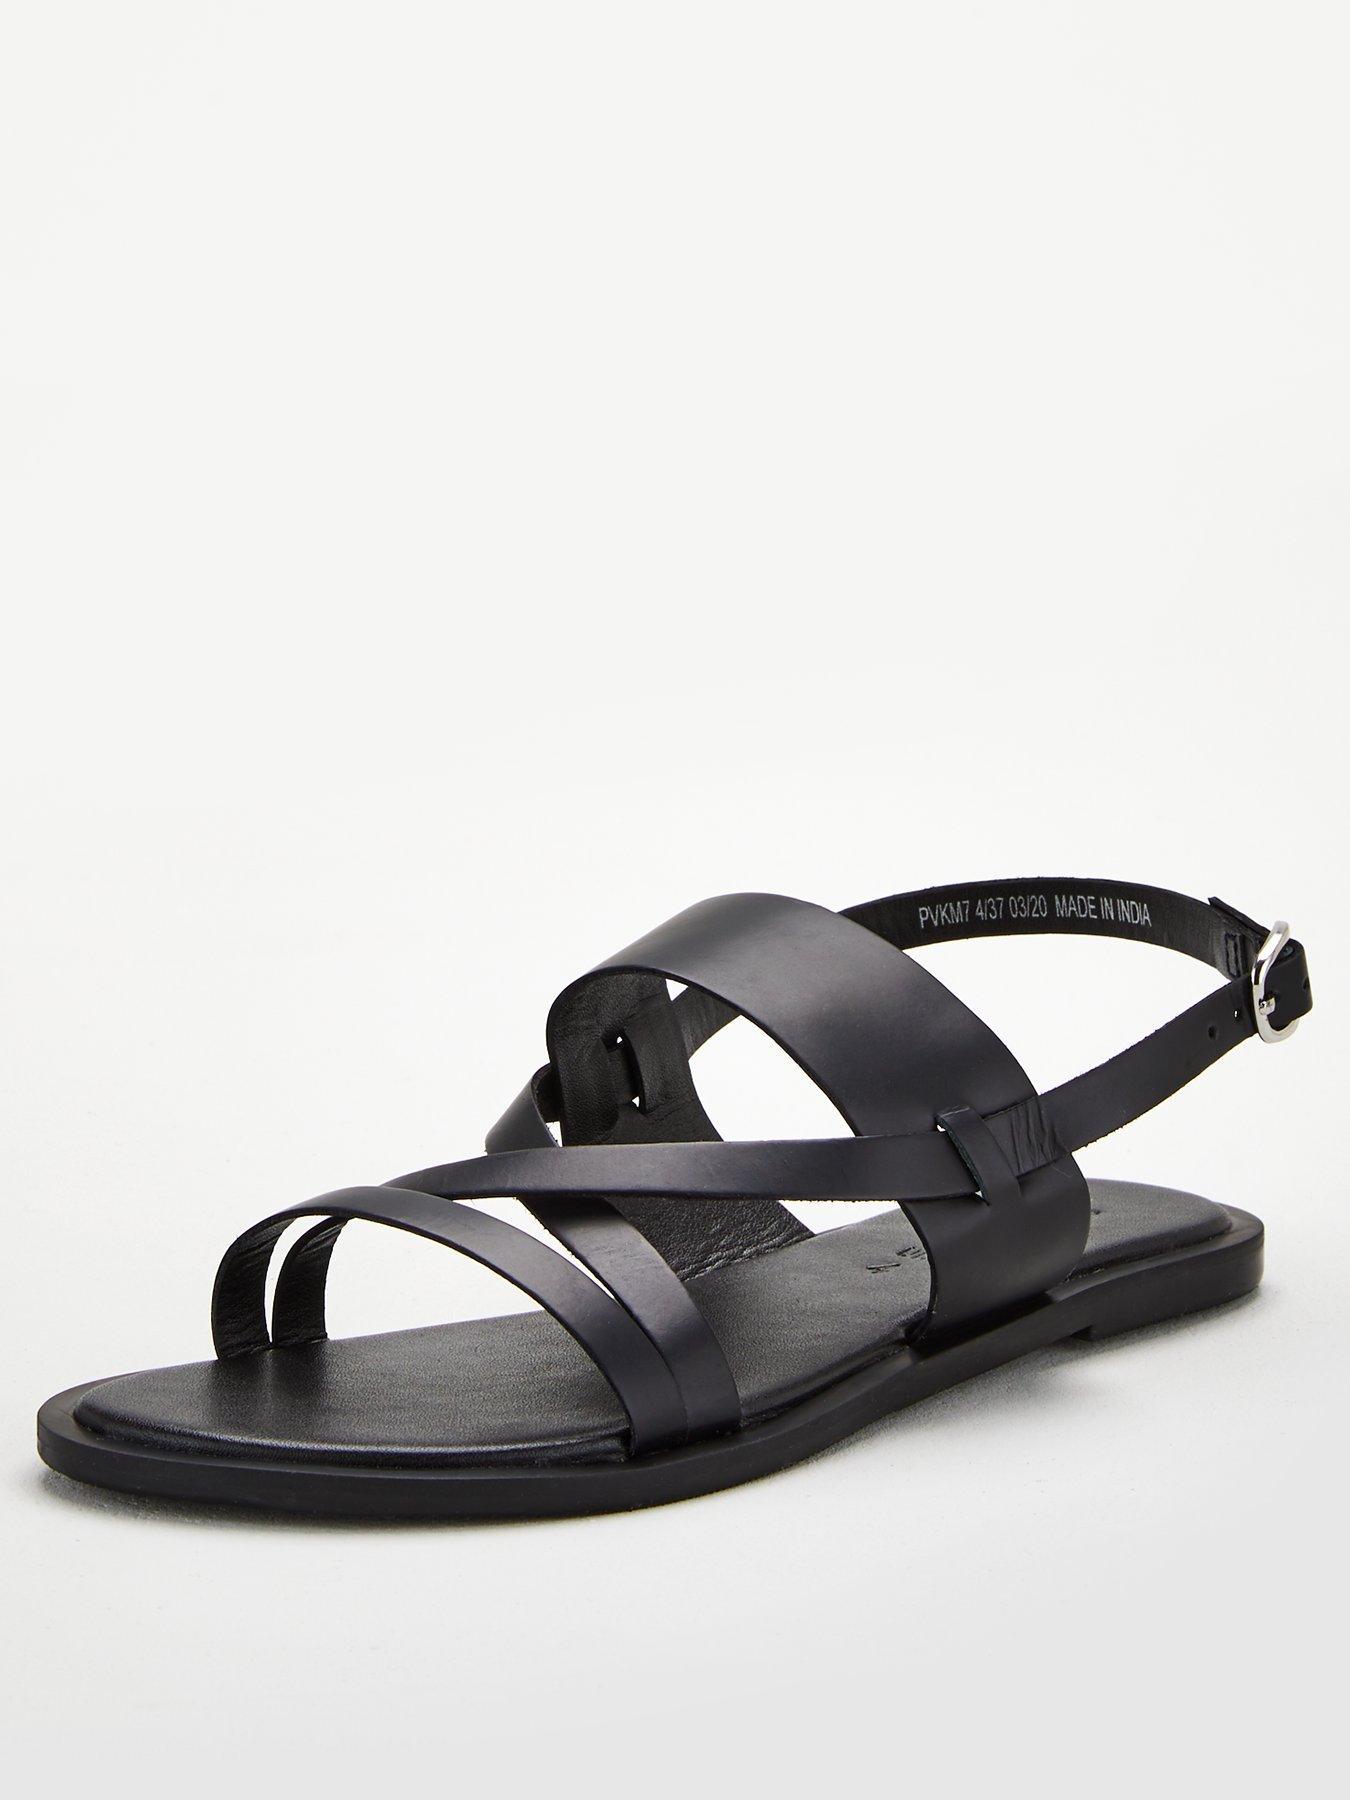 Wide | V by very | Sandals \u0026 flip flops